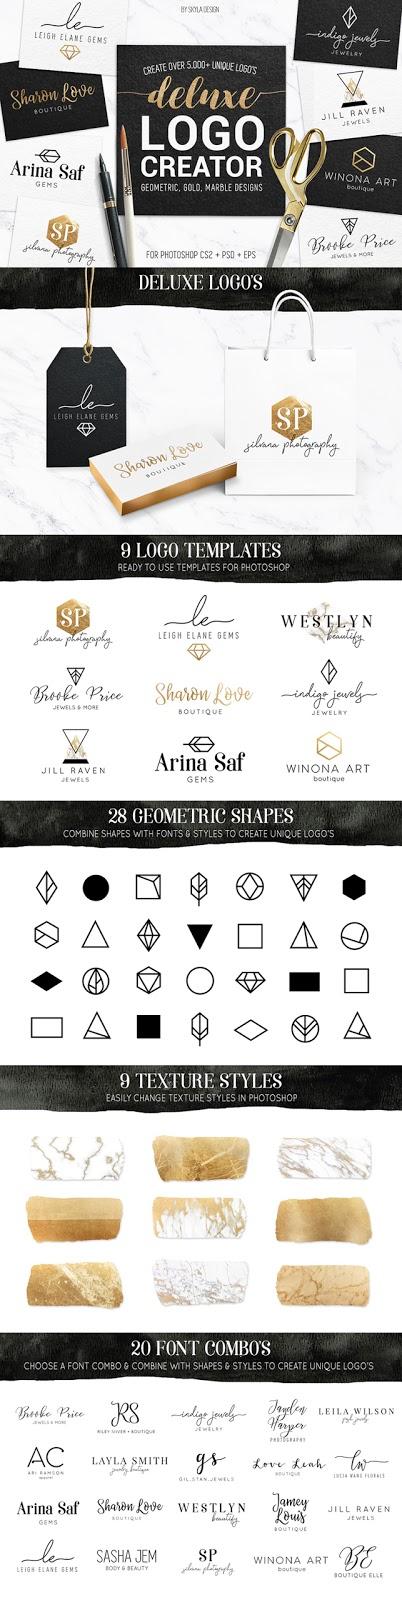 Deluxe gold logo creator kit